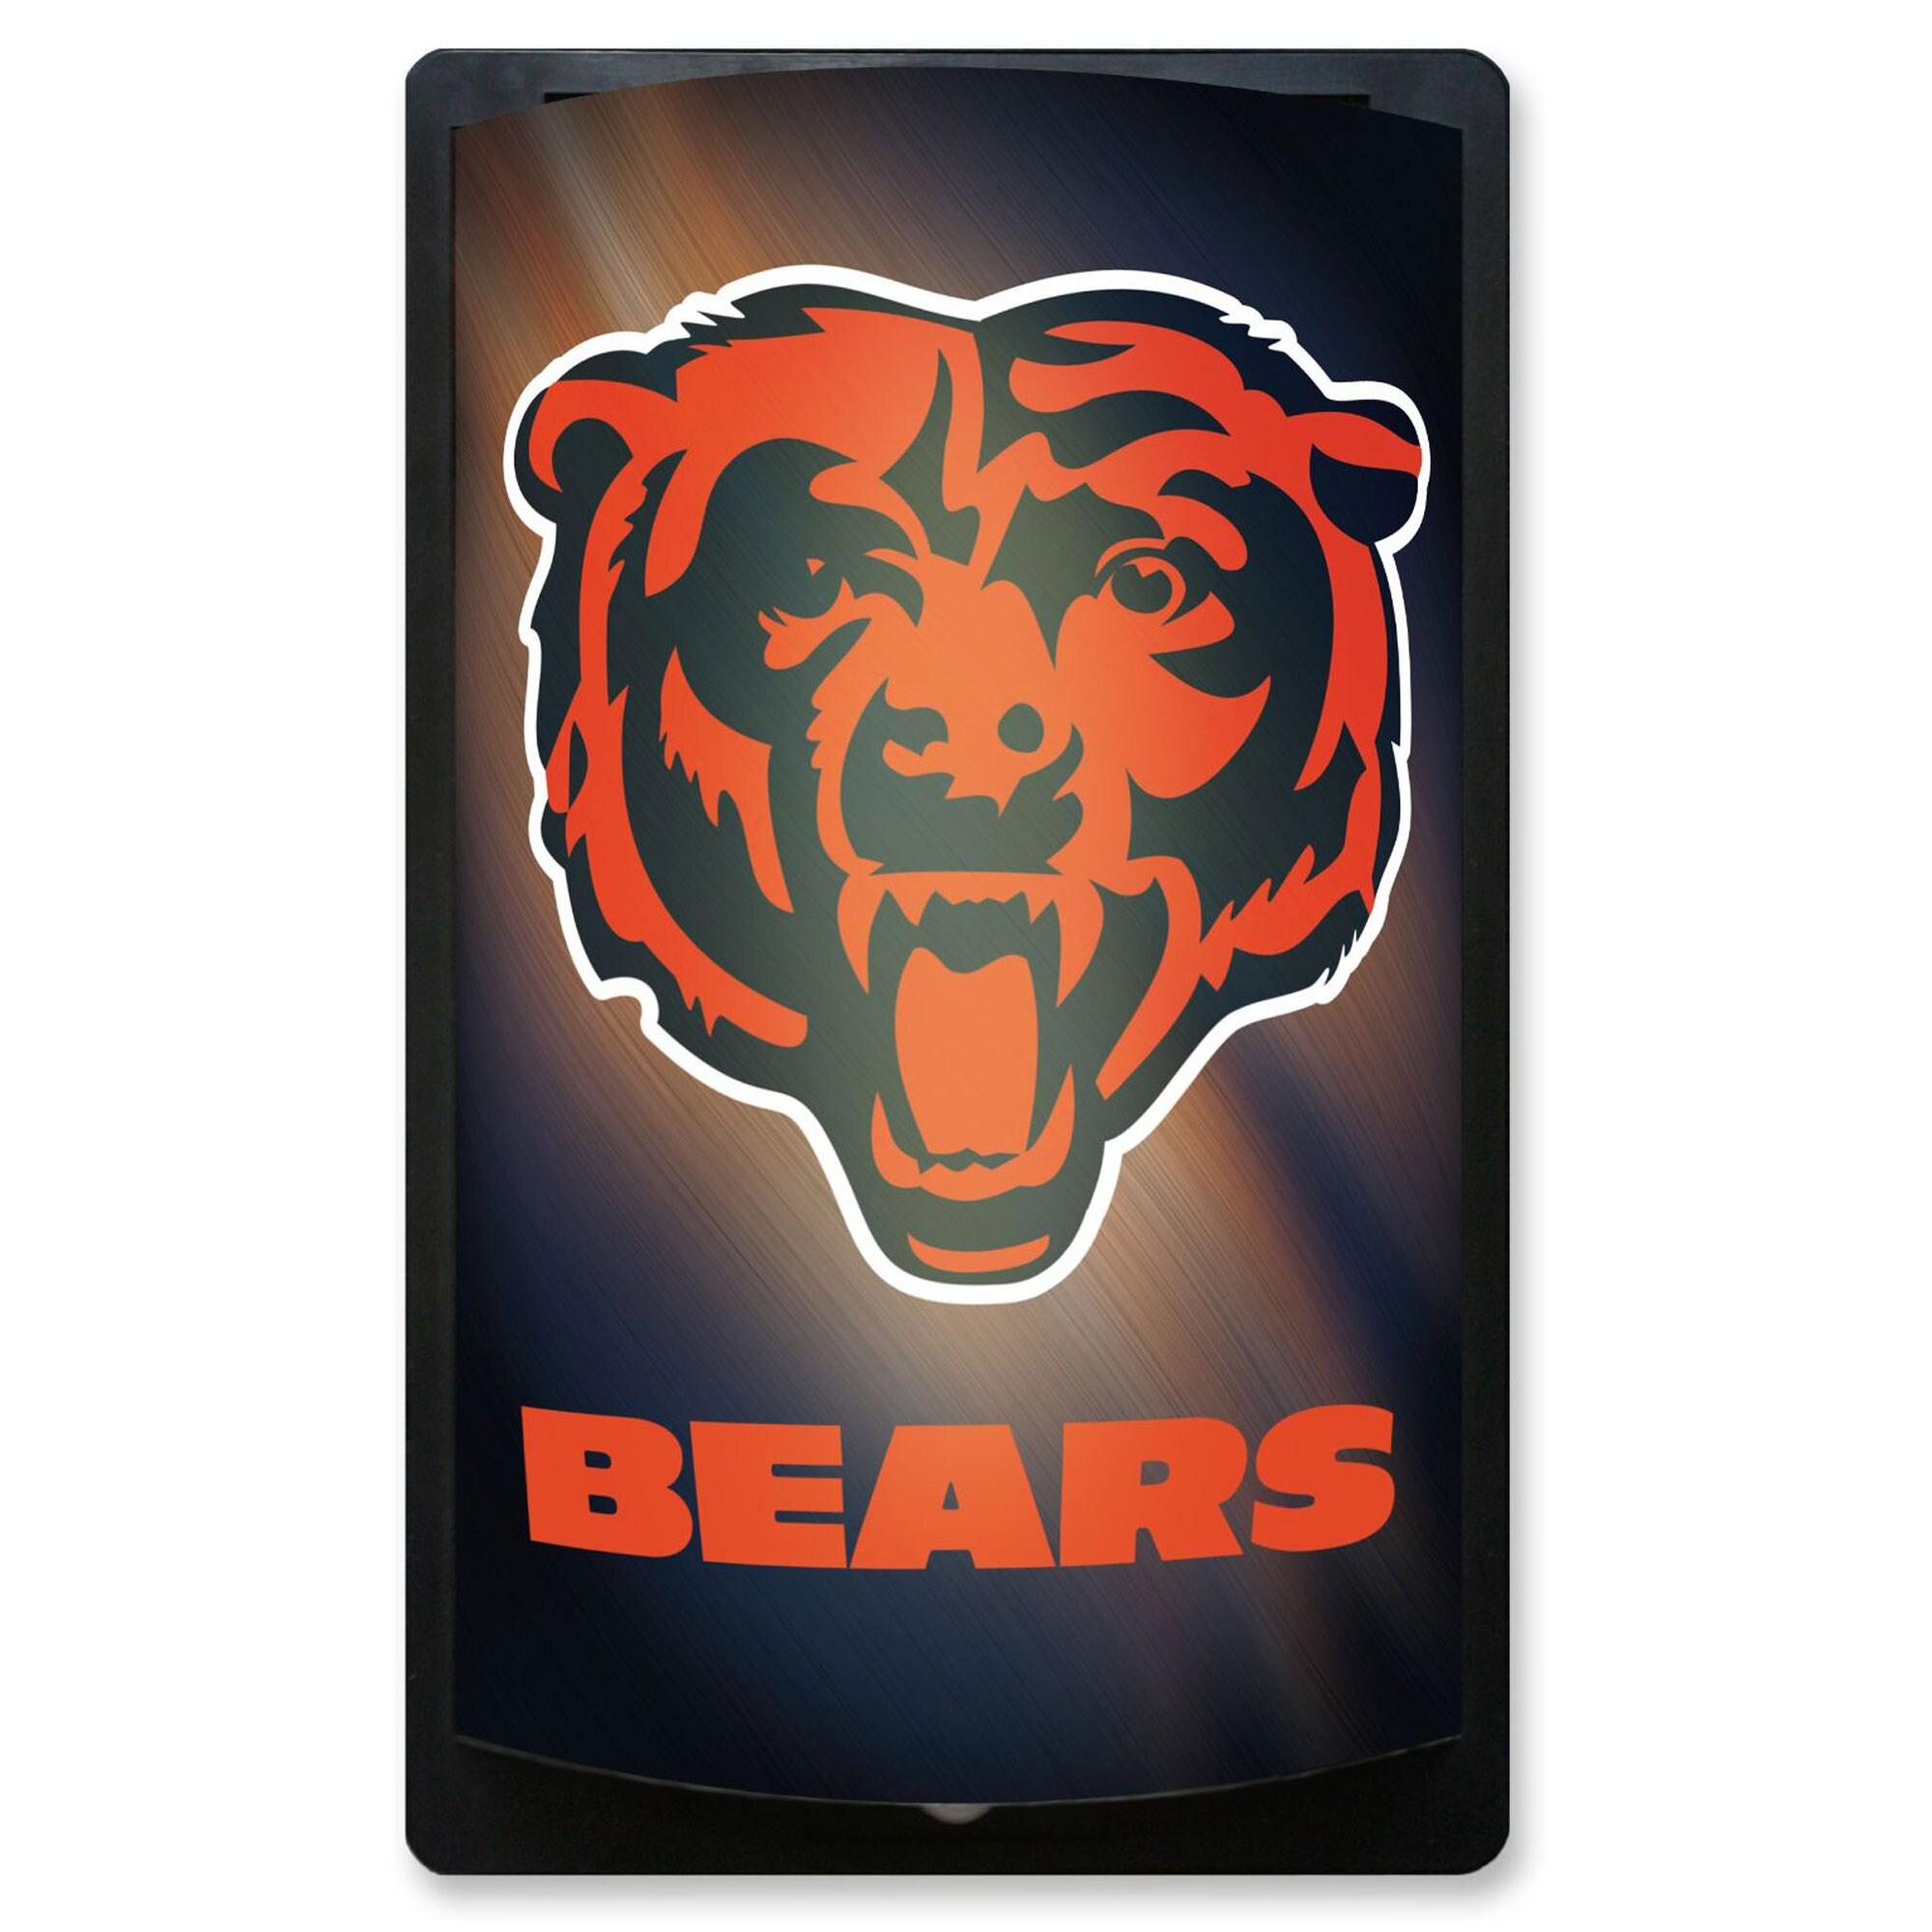 Chicago Bears 12.5'' x 7.5'' MotiGlow Sign